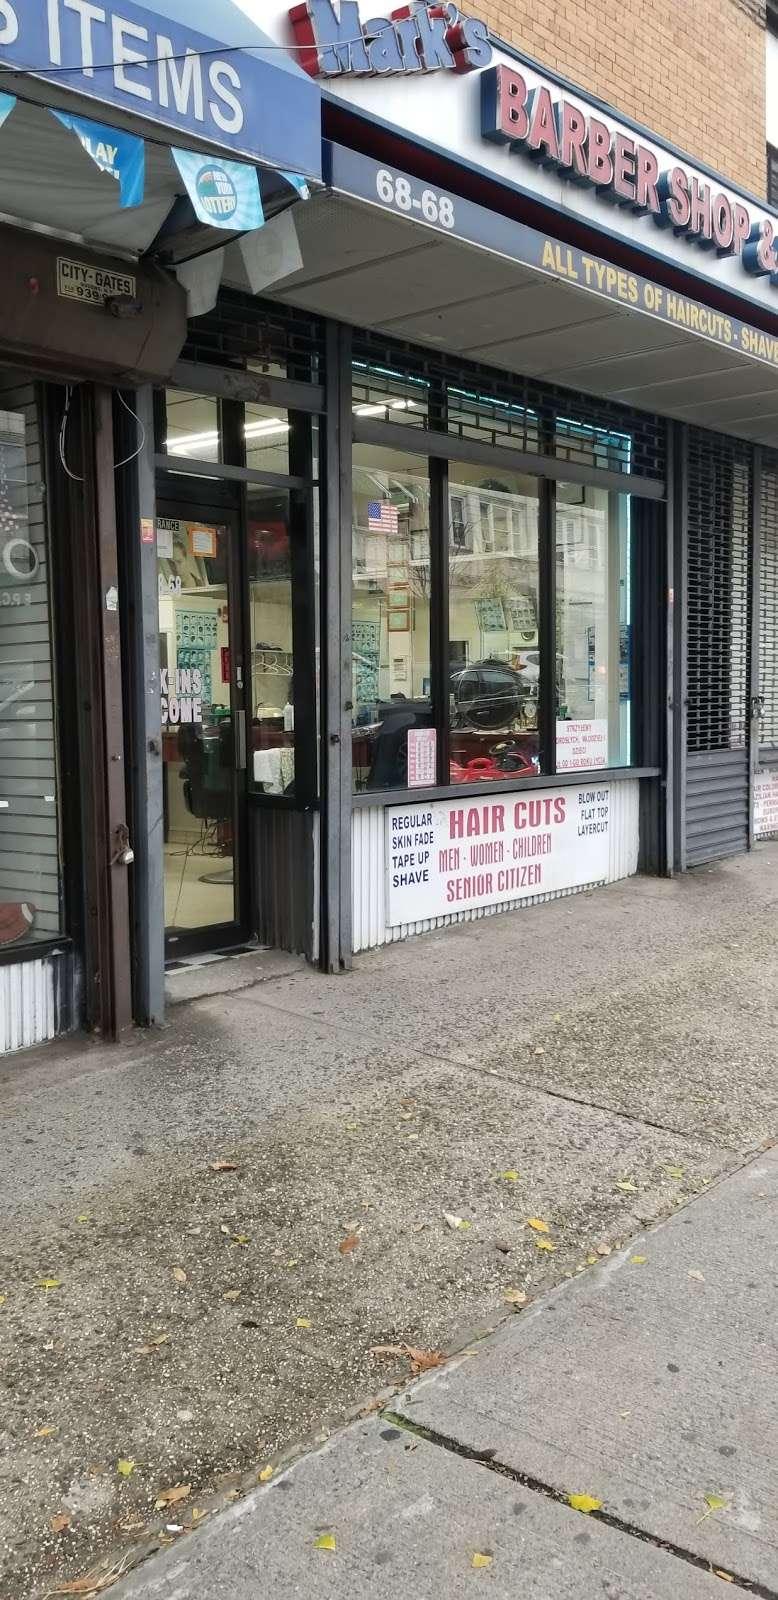 Marks Barber Shop & Beauty Salon - hair care  | Photo 1 of 6 | Address: 68-68 Fresh Pond Rd, Ridgewood, NY 11385, USA